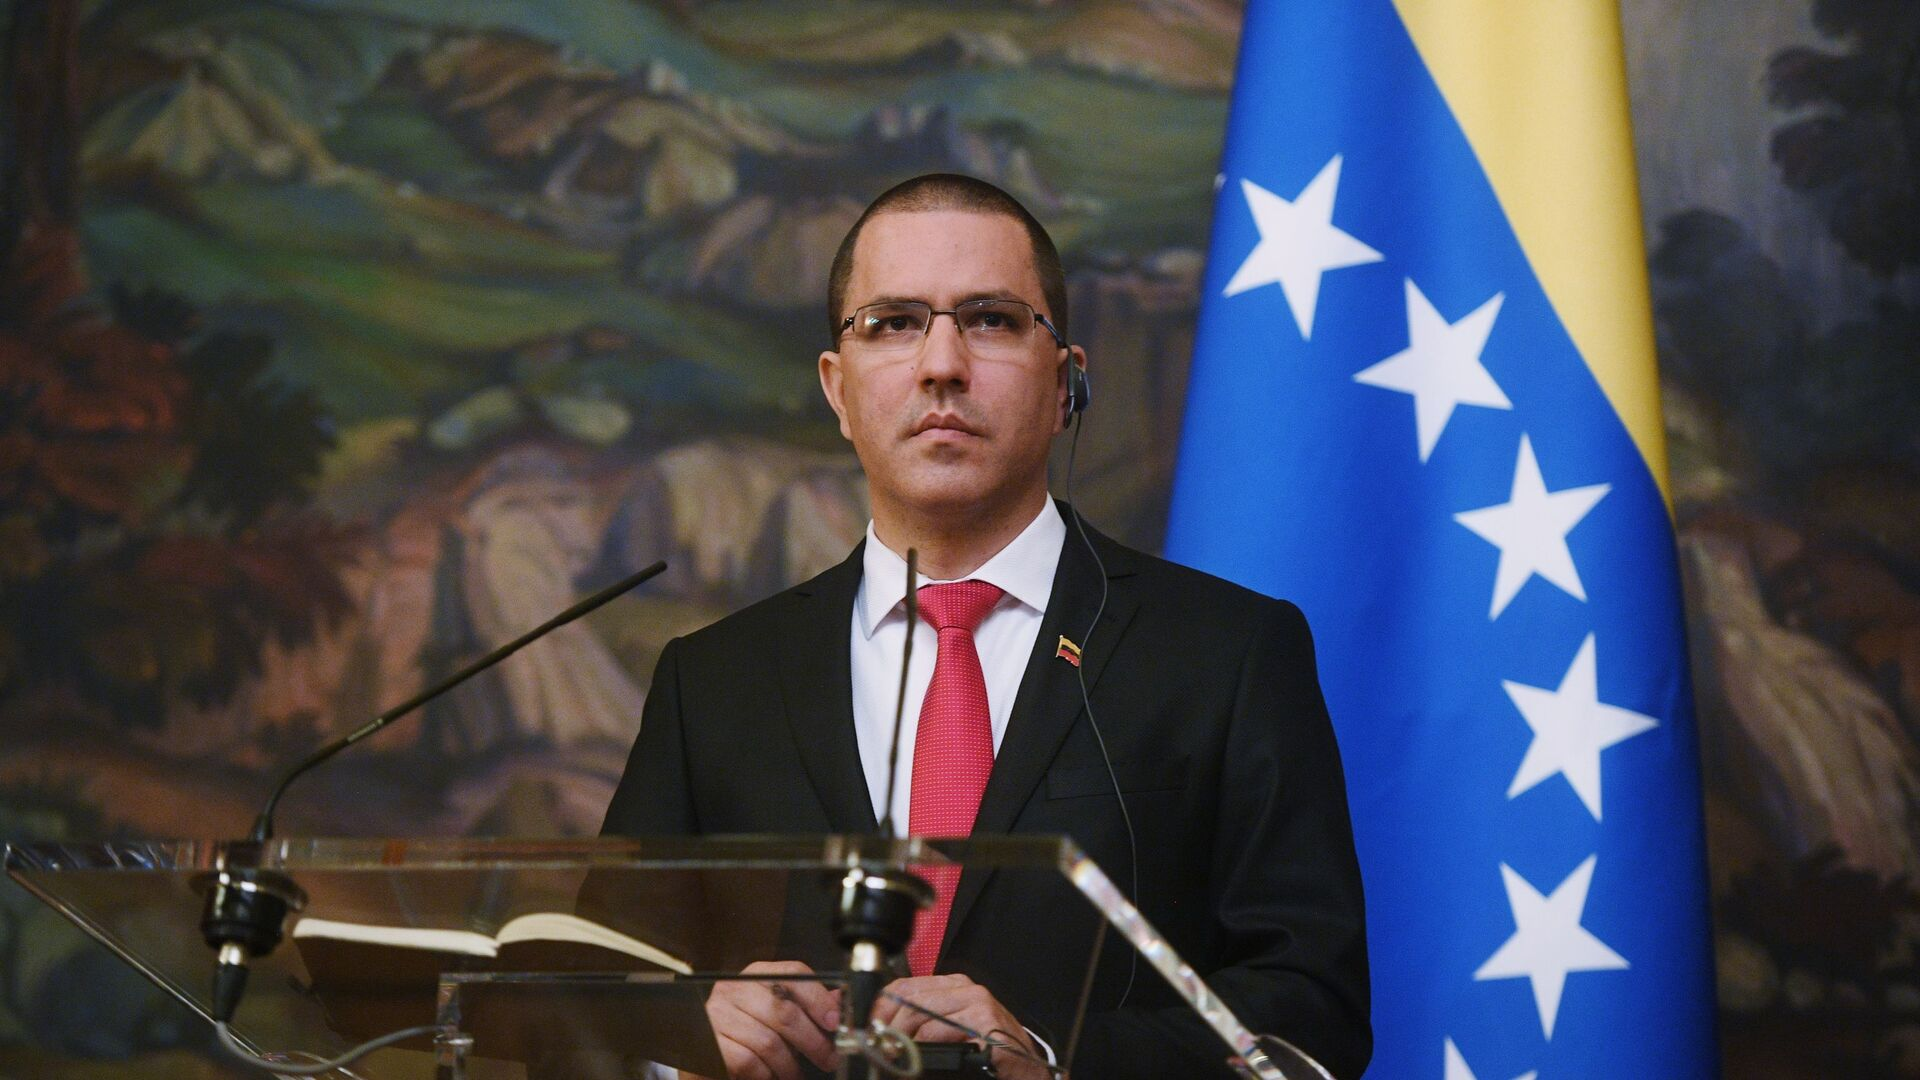 Jorge Arreaza, canciller de Venezuela - Sputnik Mundo, 1920, 22.04.2021